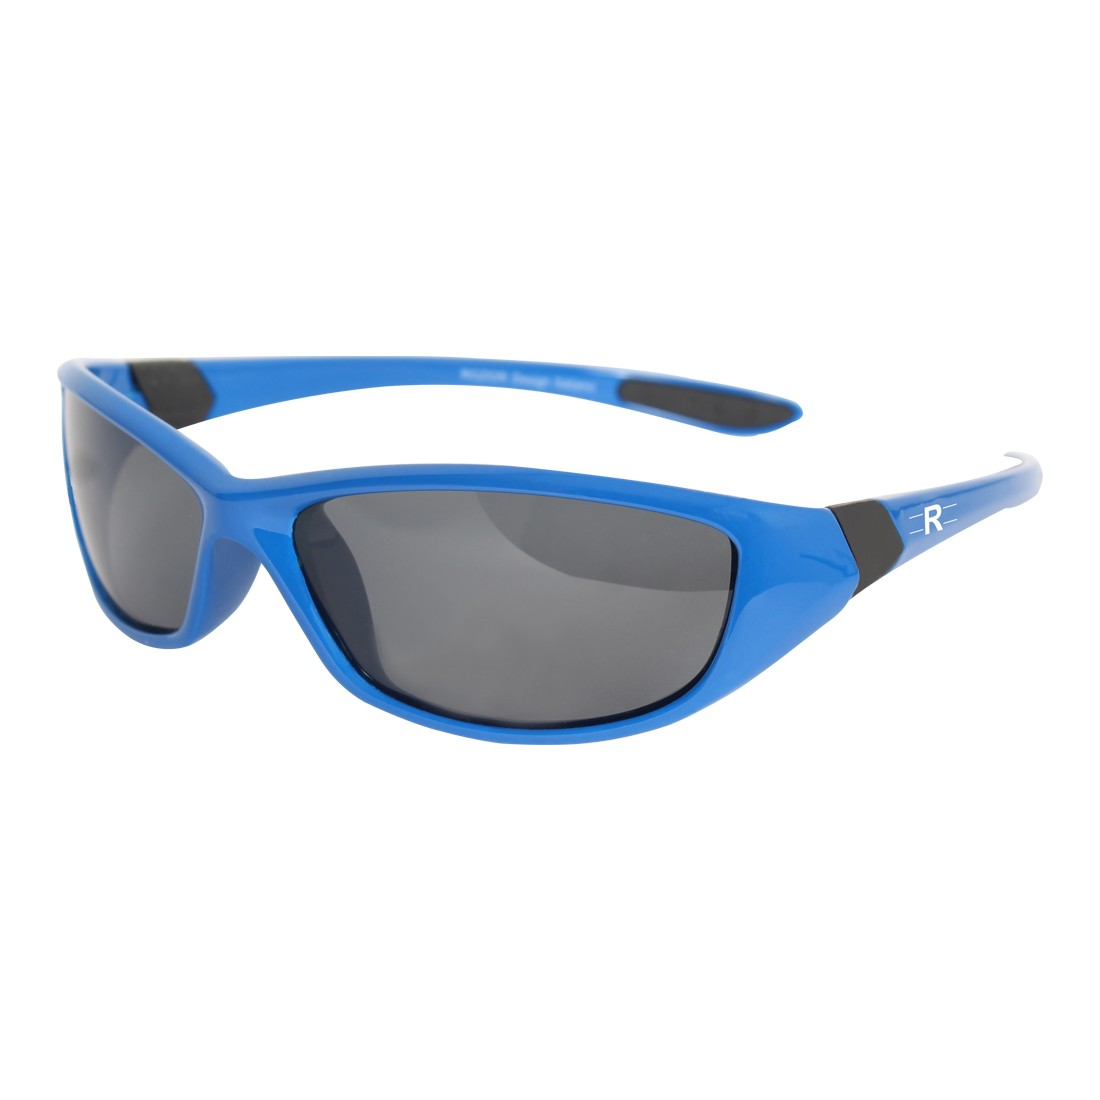 Rozior Men Women Polarized Sunglass with UV Protection Smoke Lens with Blue Frame, MODEL: RWPP510C2